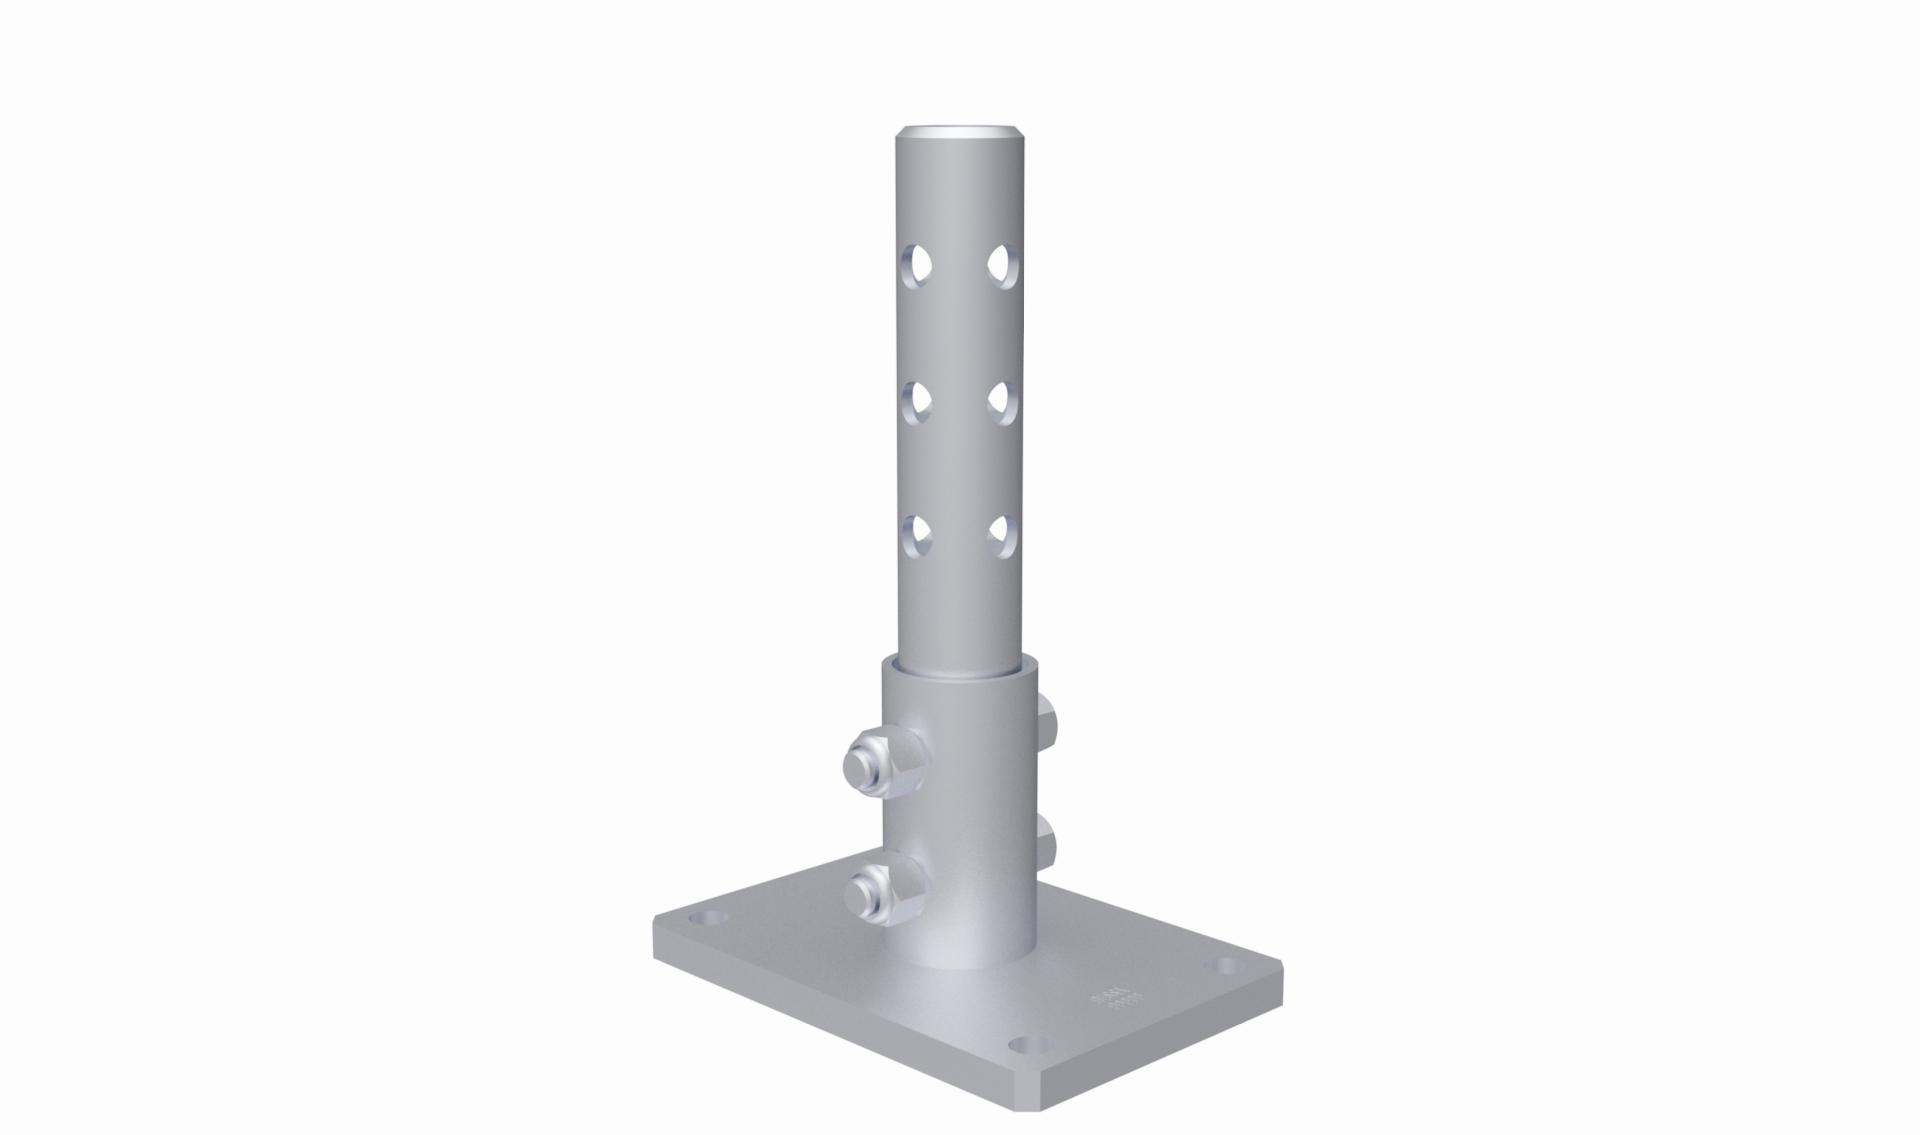 Castor Tube Stem Top Plates